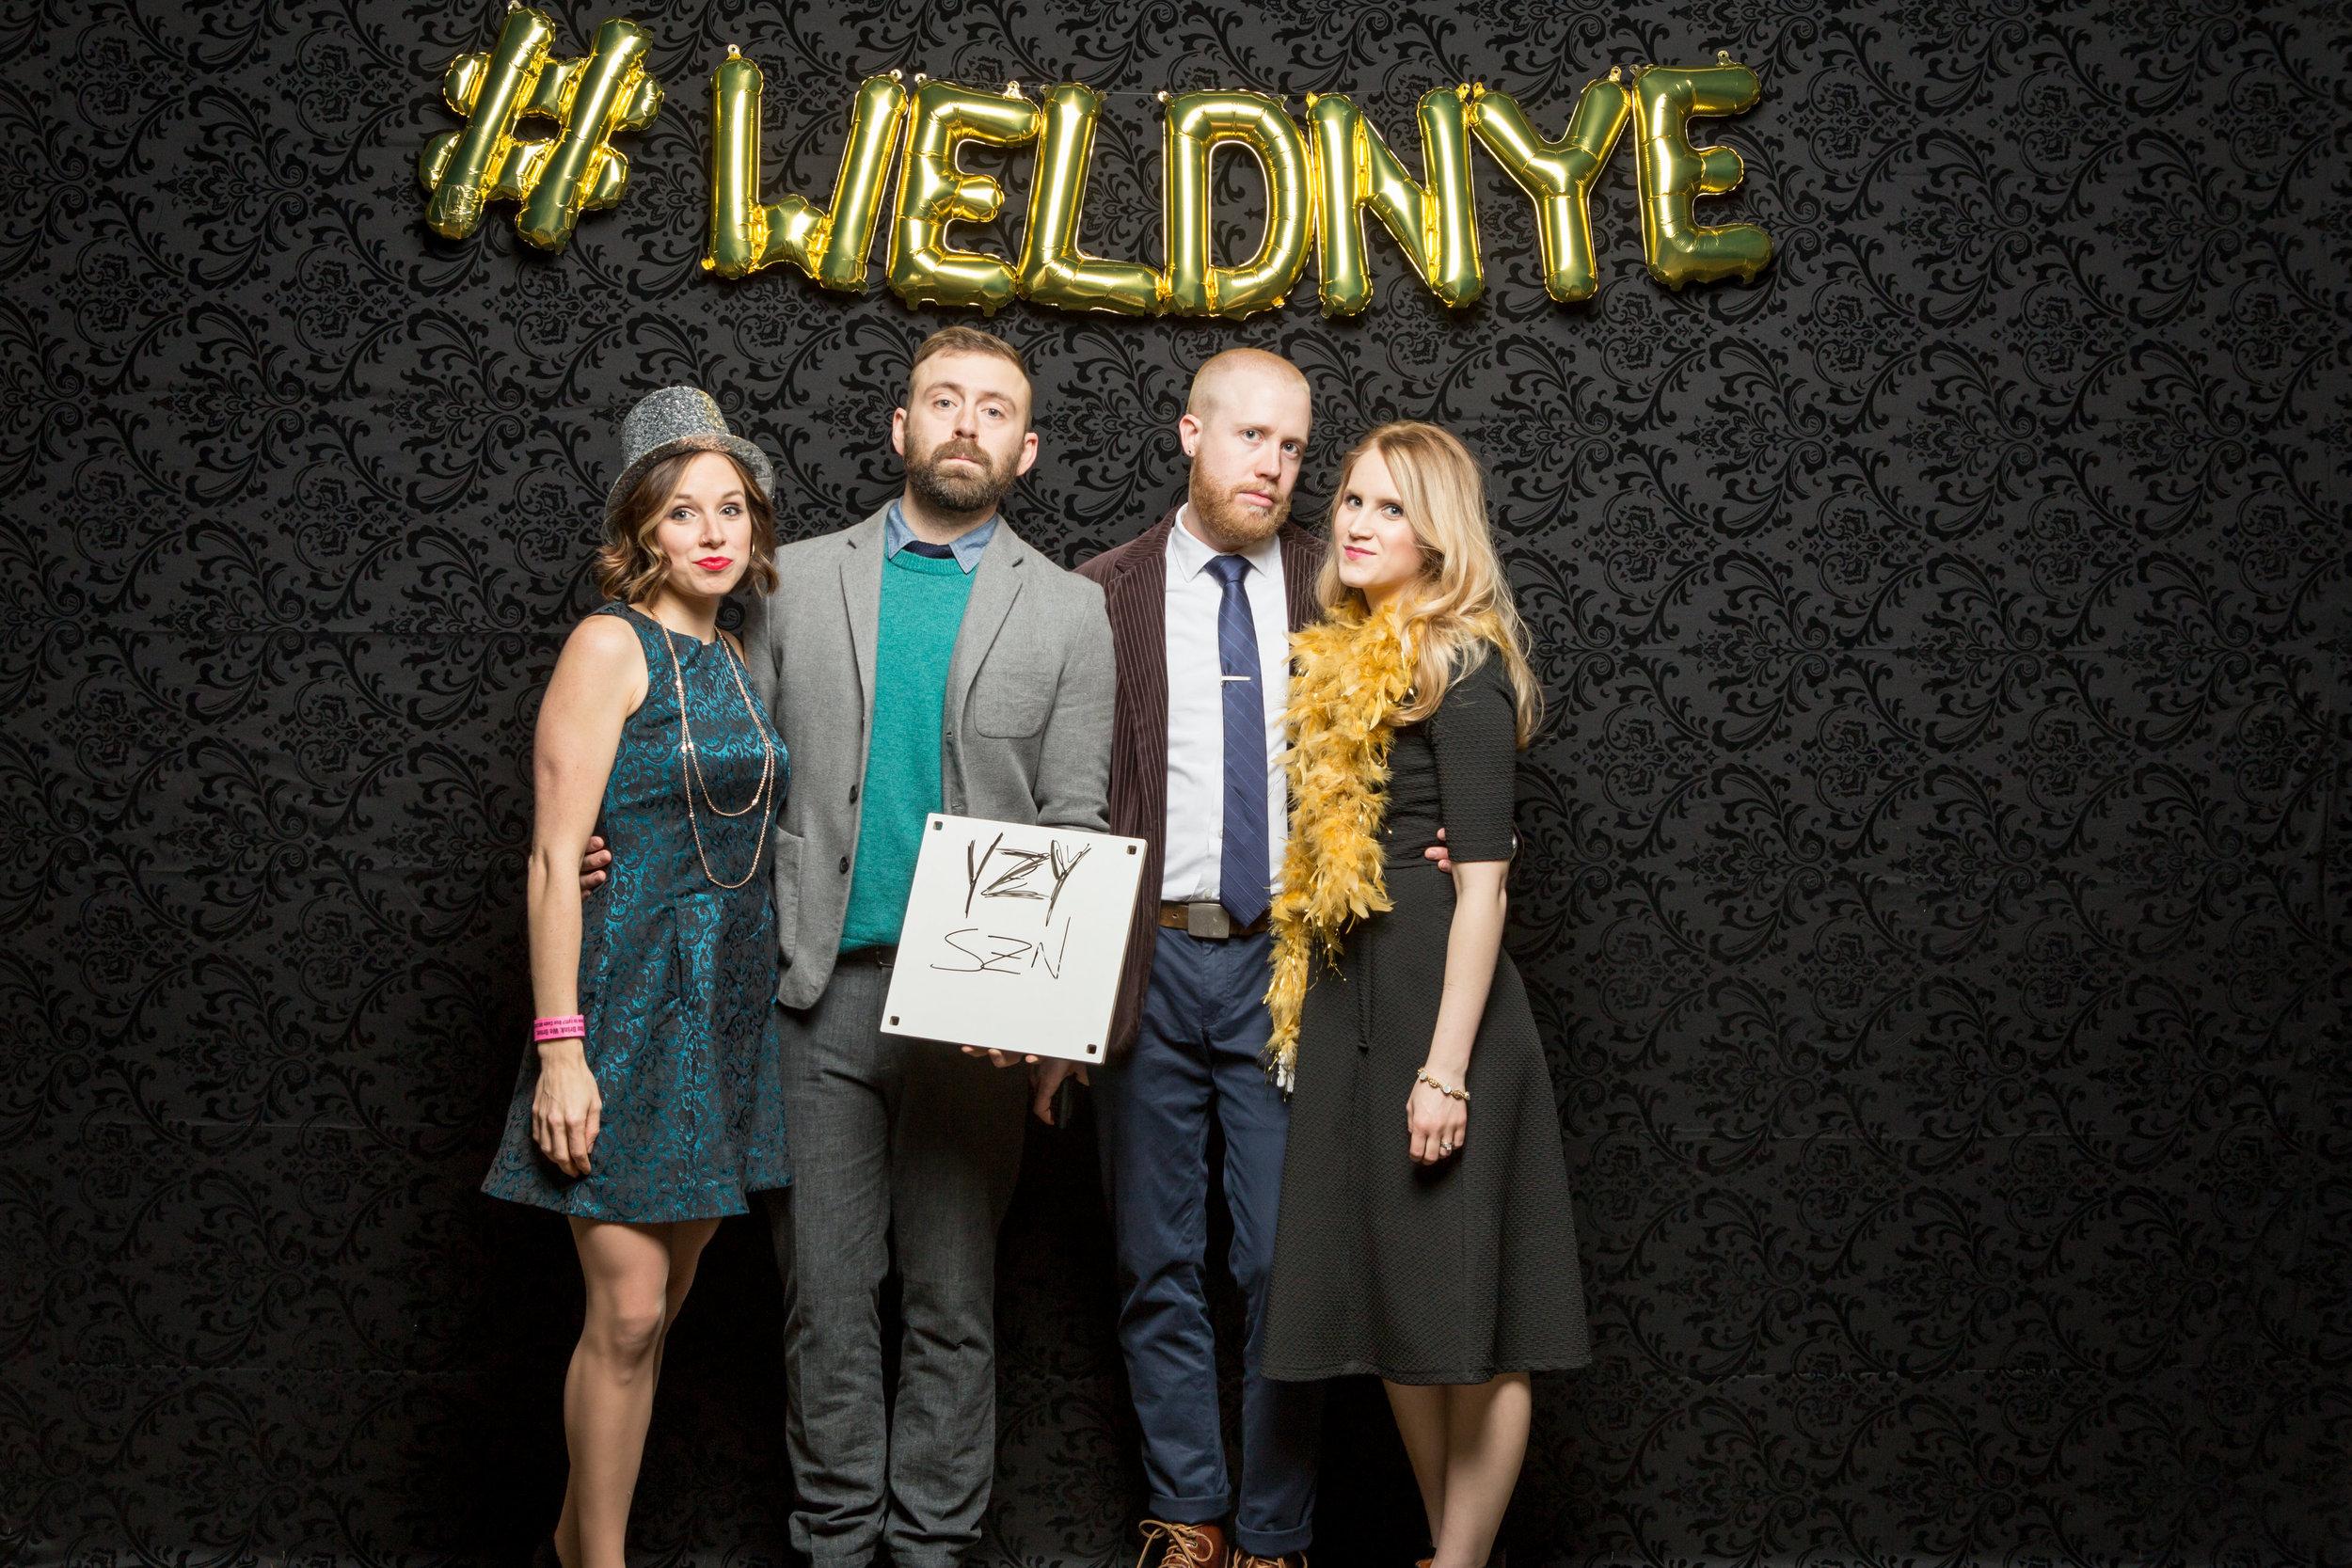 #WELDNYE Nashville